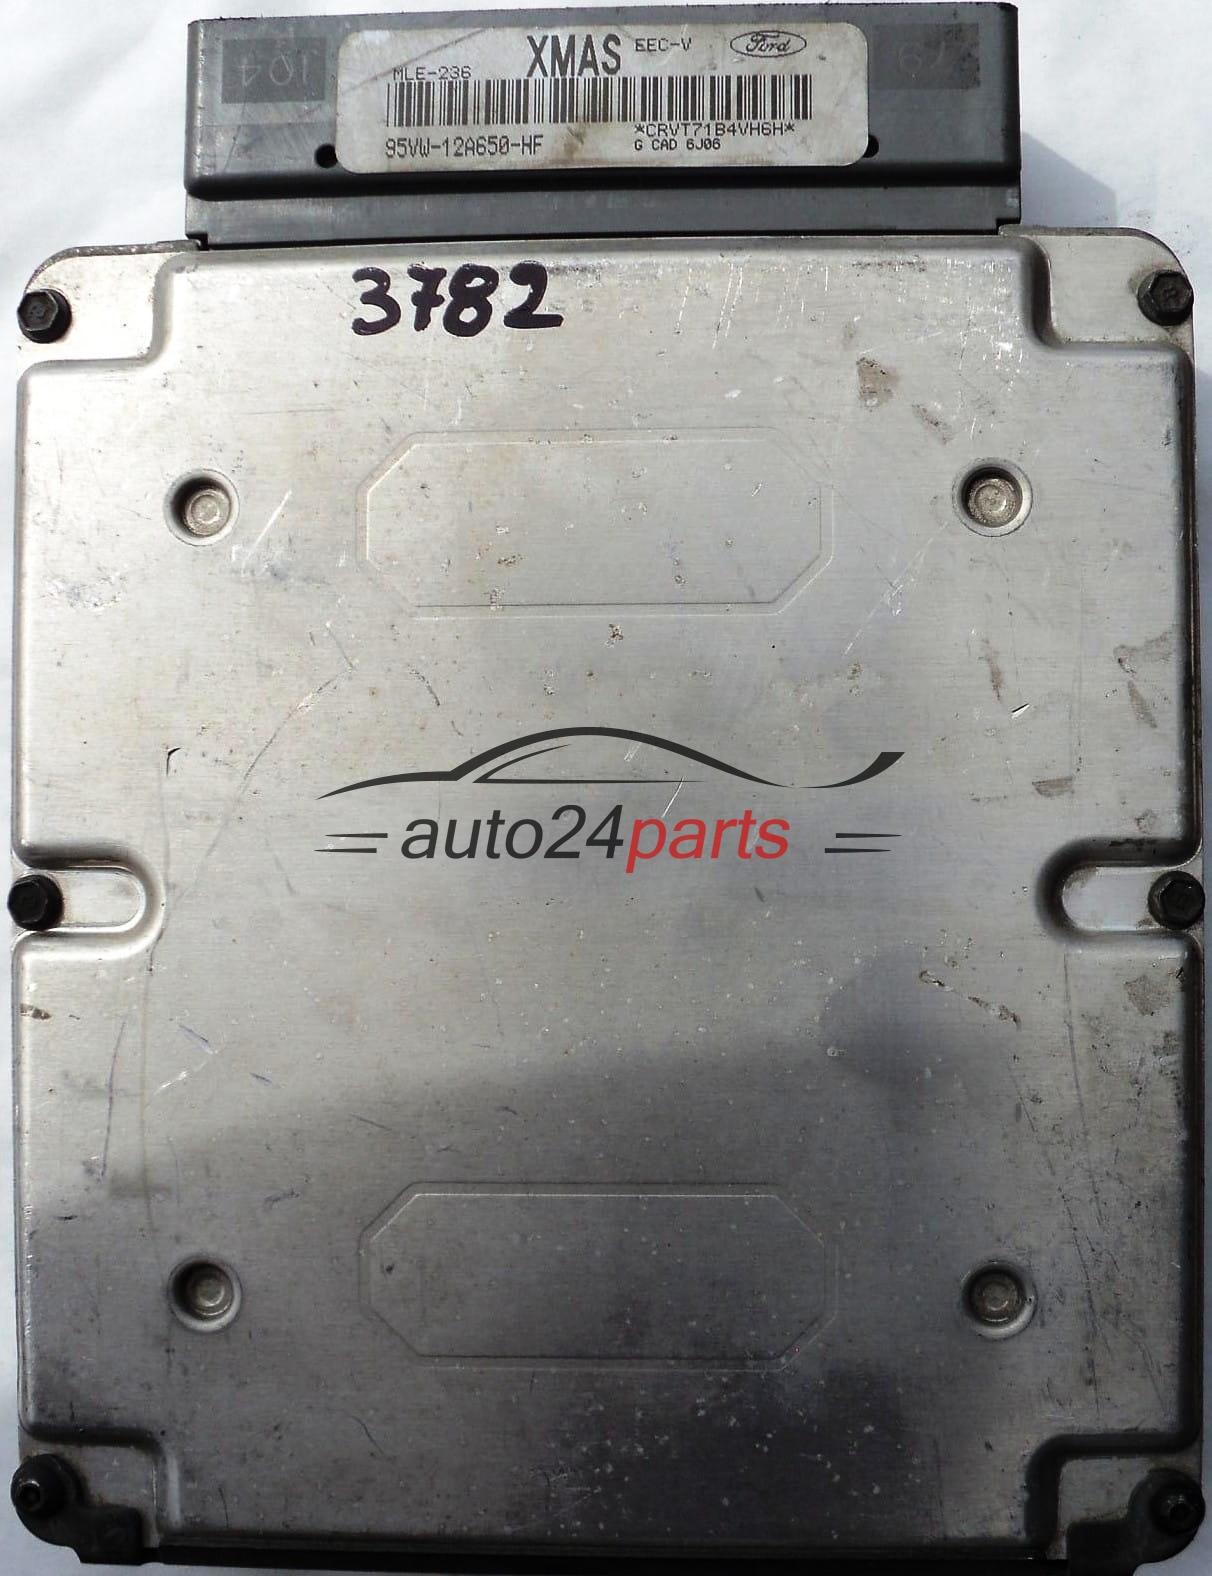 ECU ENGINE CONTROLLER FORD GALAXY 2 3 95VW12A650HF XMAS MLE-236 EEC-V,  95VW-12A650-HF